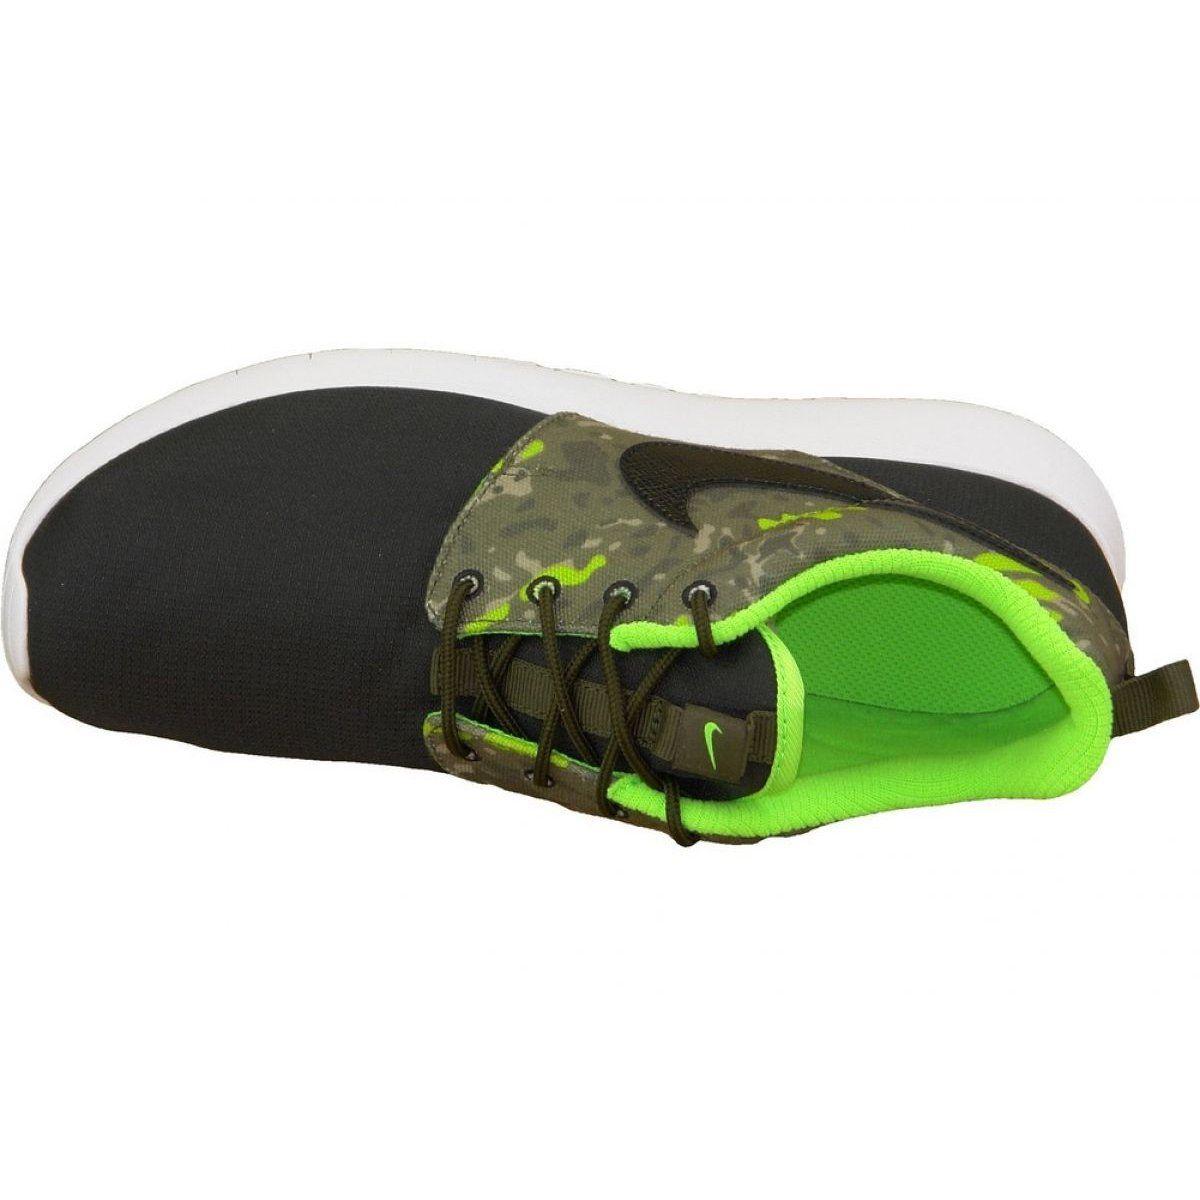 Buty Nike Roshe One Print Gs M 677782 008 Czarne Wielokolorowe Zielone Nike Roshe Mens Nike Shoes Nike